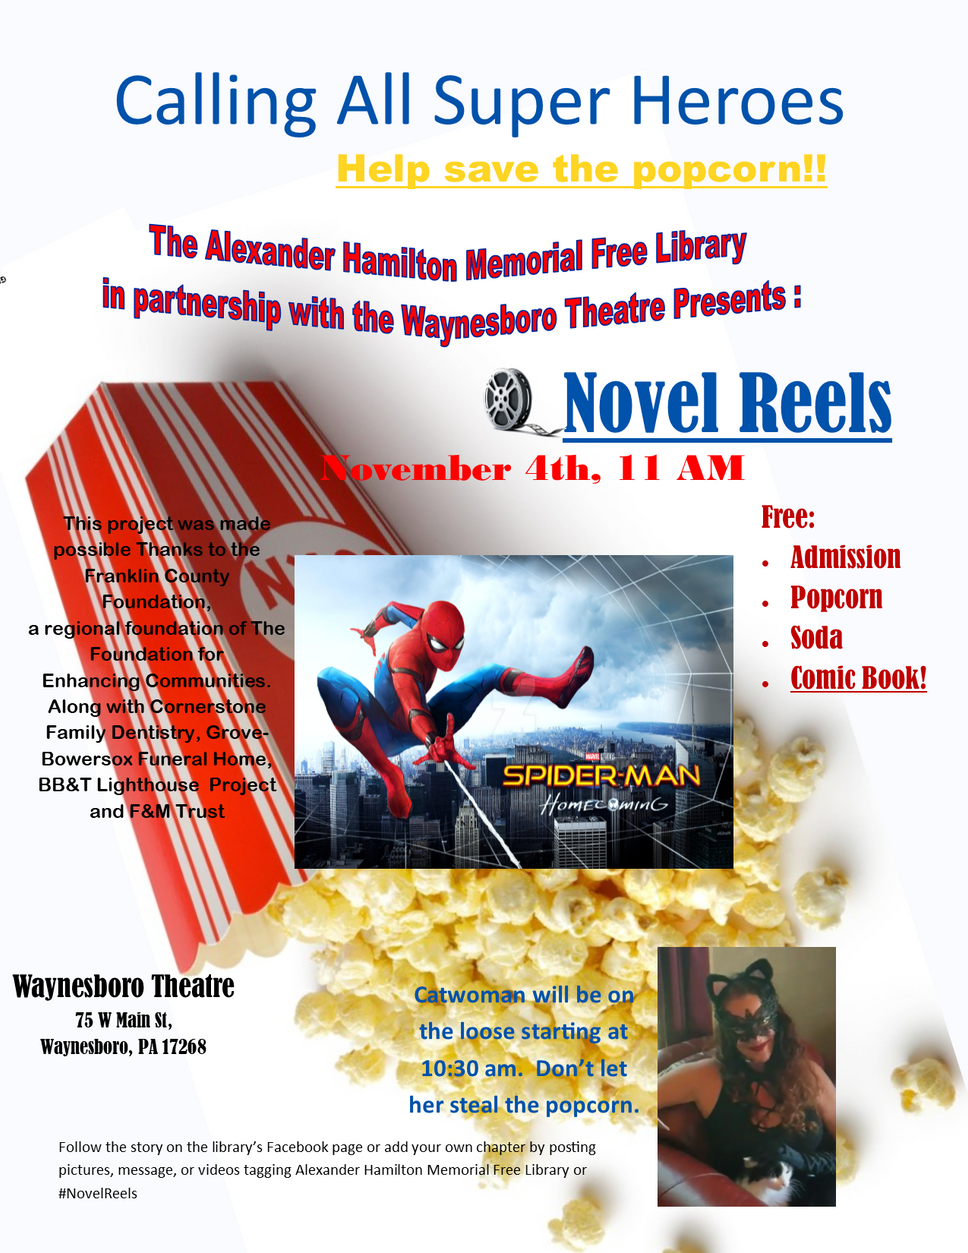 Catwomen Vows to Pilfer Popcorn at Novel Reels